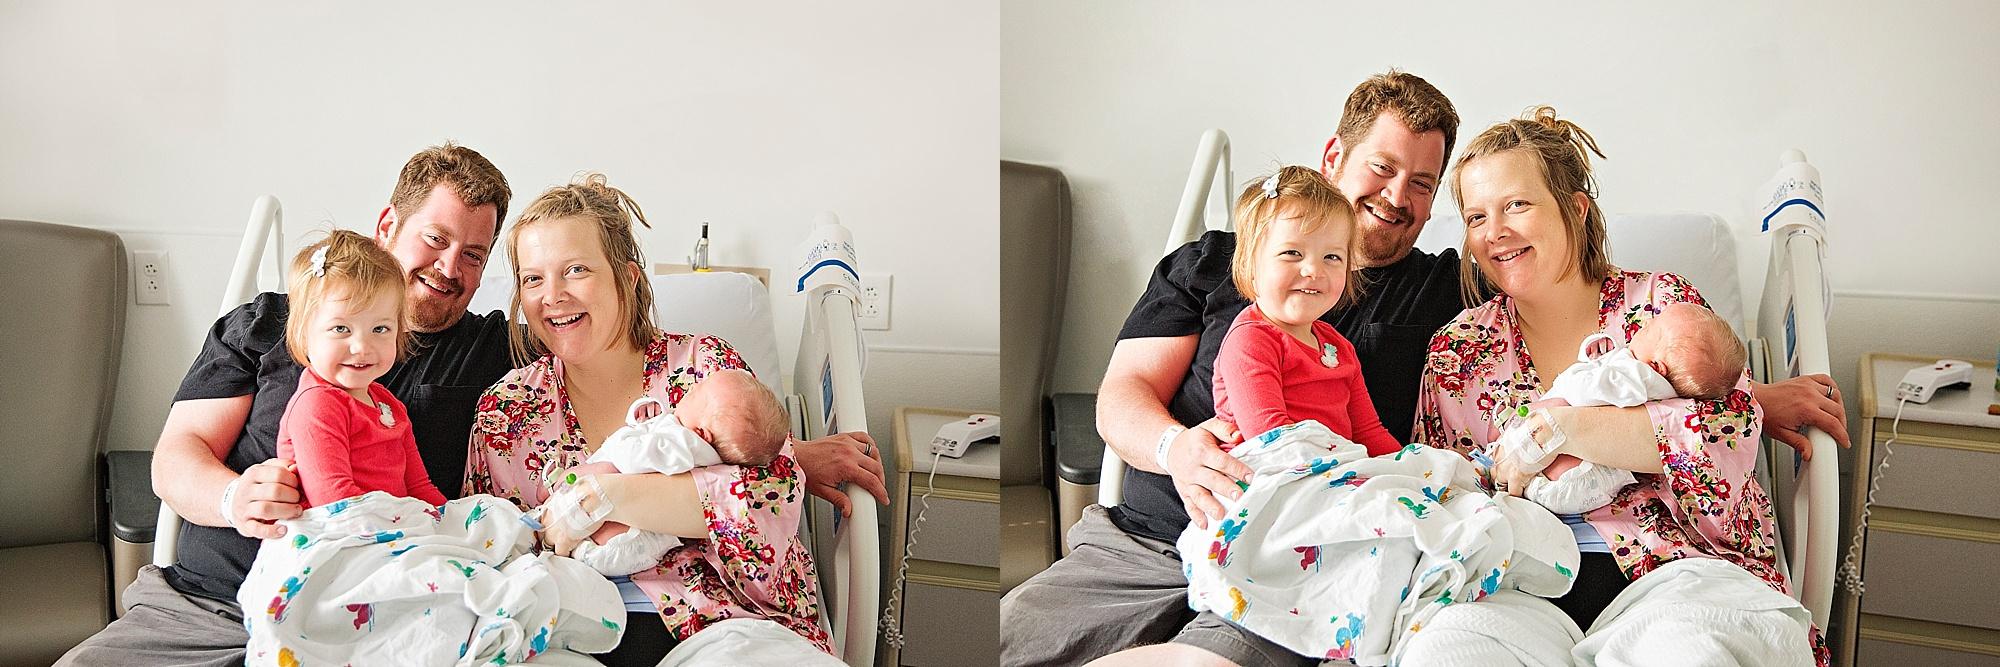 lauren-grayson-photography-akron-ohio-photographer-family-newborn-fresh-48-baby-hospital-photo-shoot-cleveland-clinic-akron-general-carter_0332.jpg